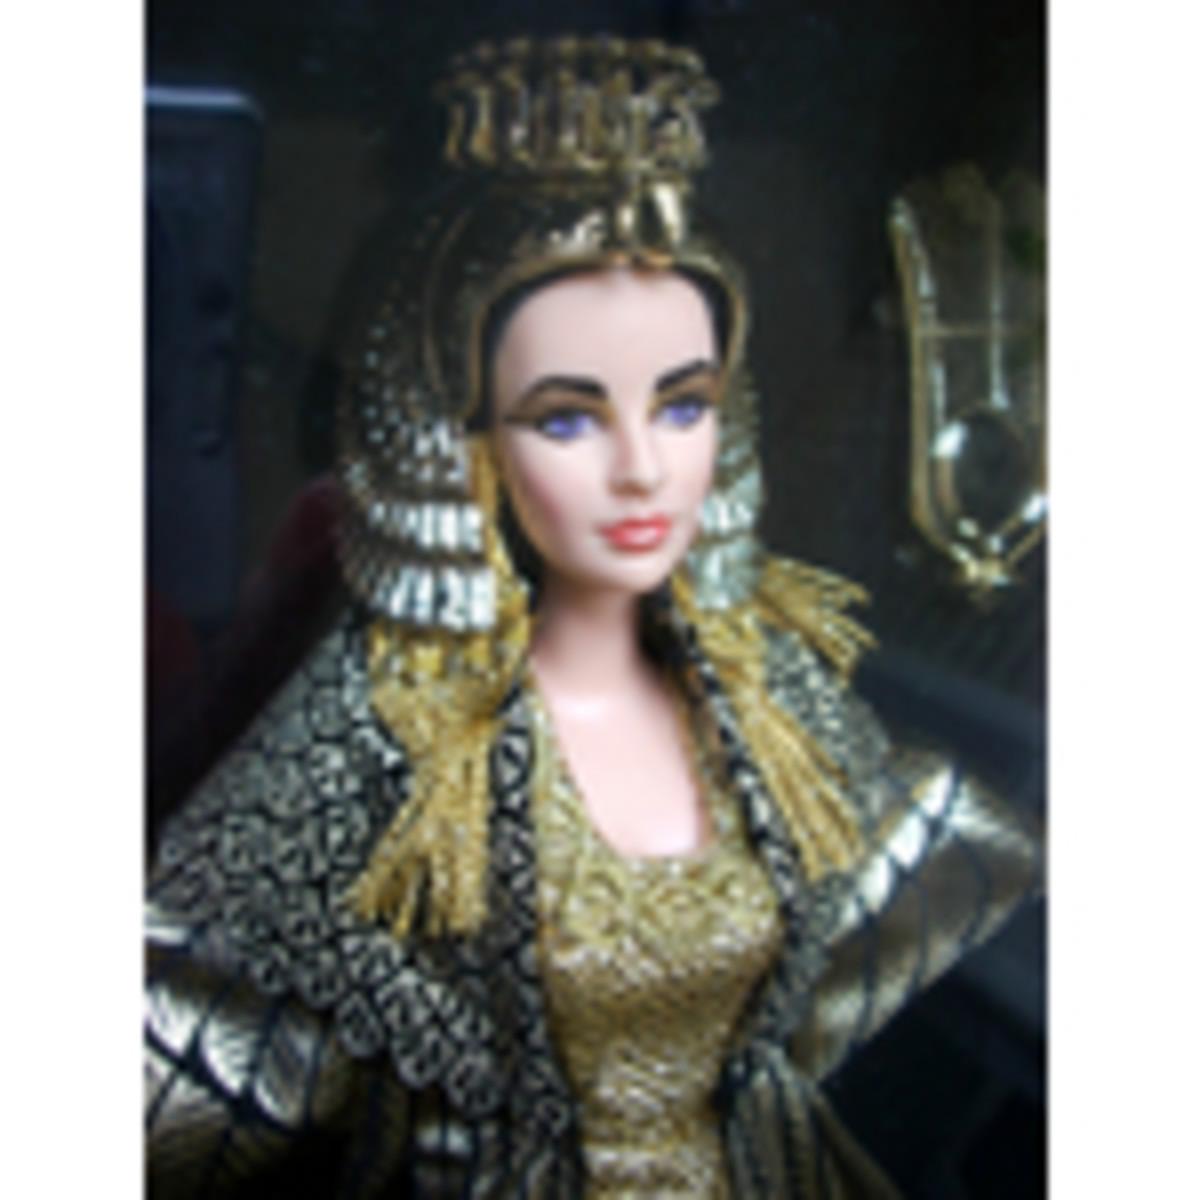 Barbie - Liz Taylor Cleopatra - photo courtesy of ioffer.com